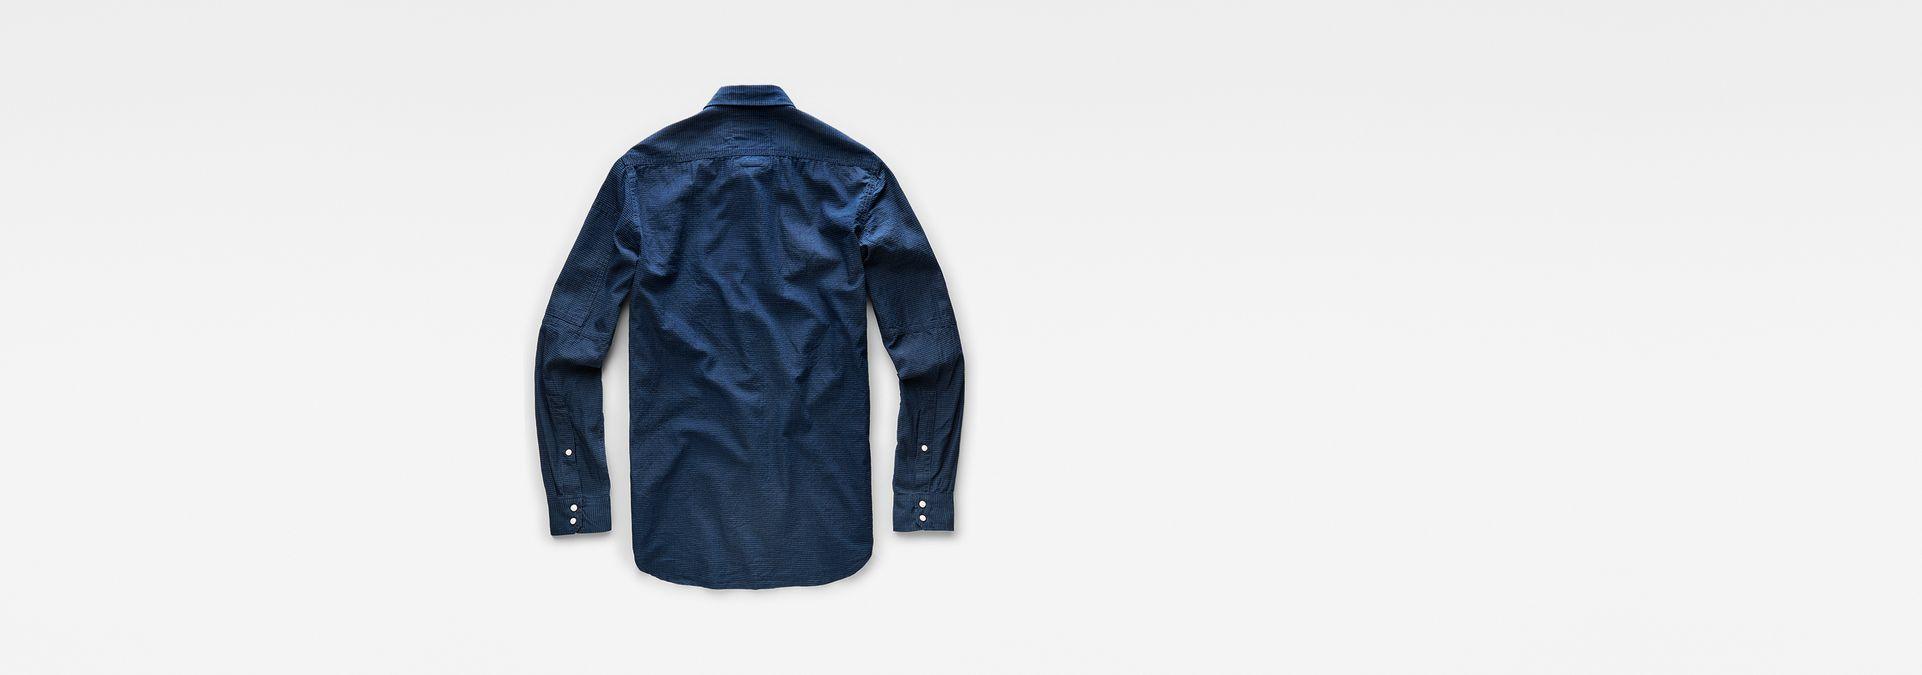 6764a8560 ... G-Star RAW® Stalt Clean Denim Shirt Dark blue